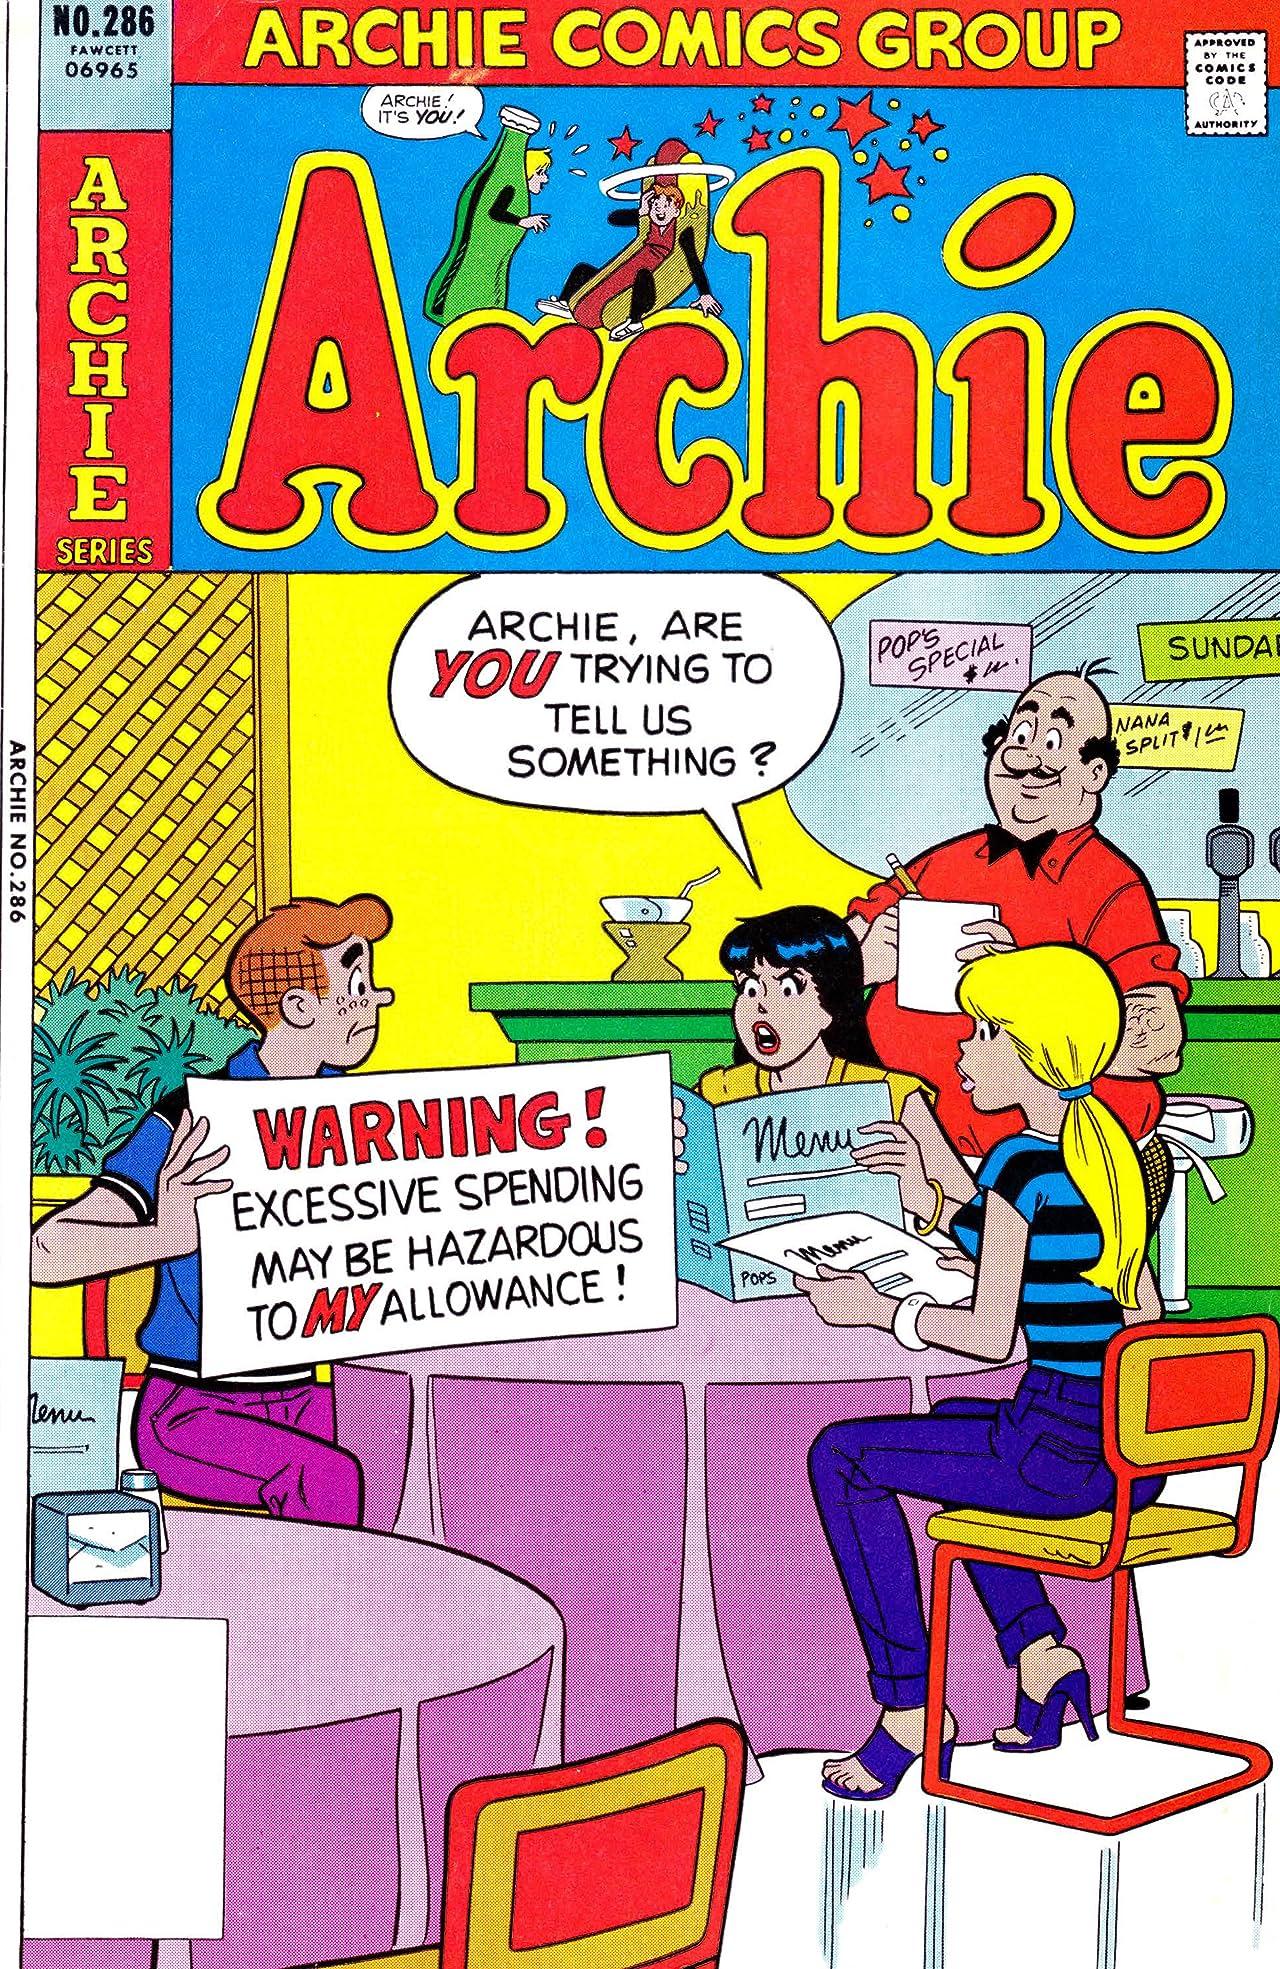 Archie #286